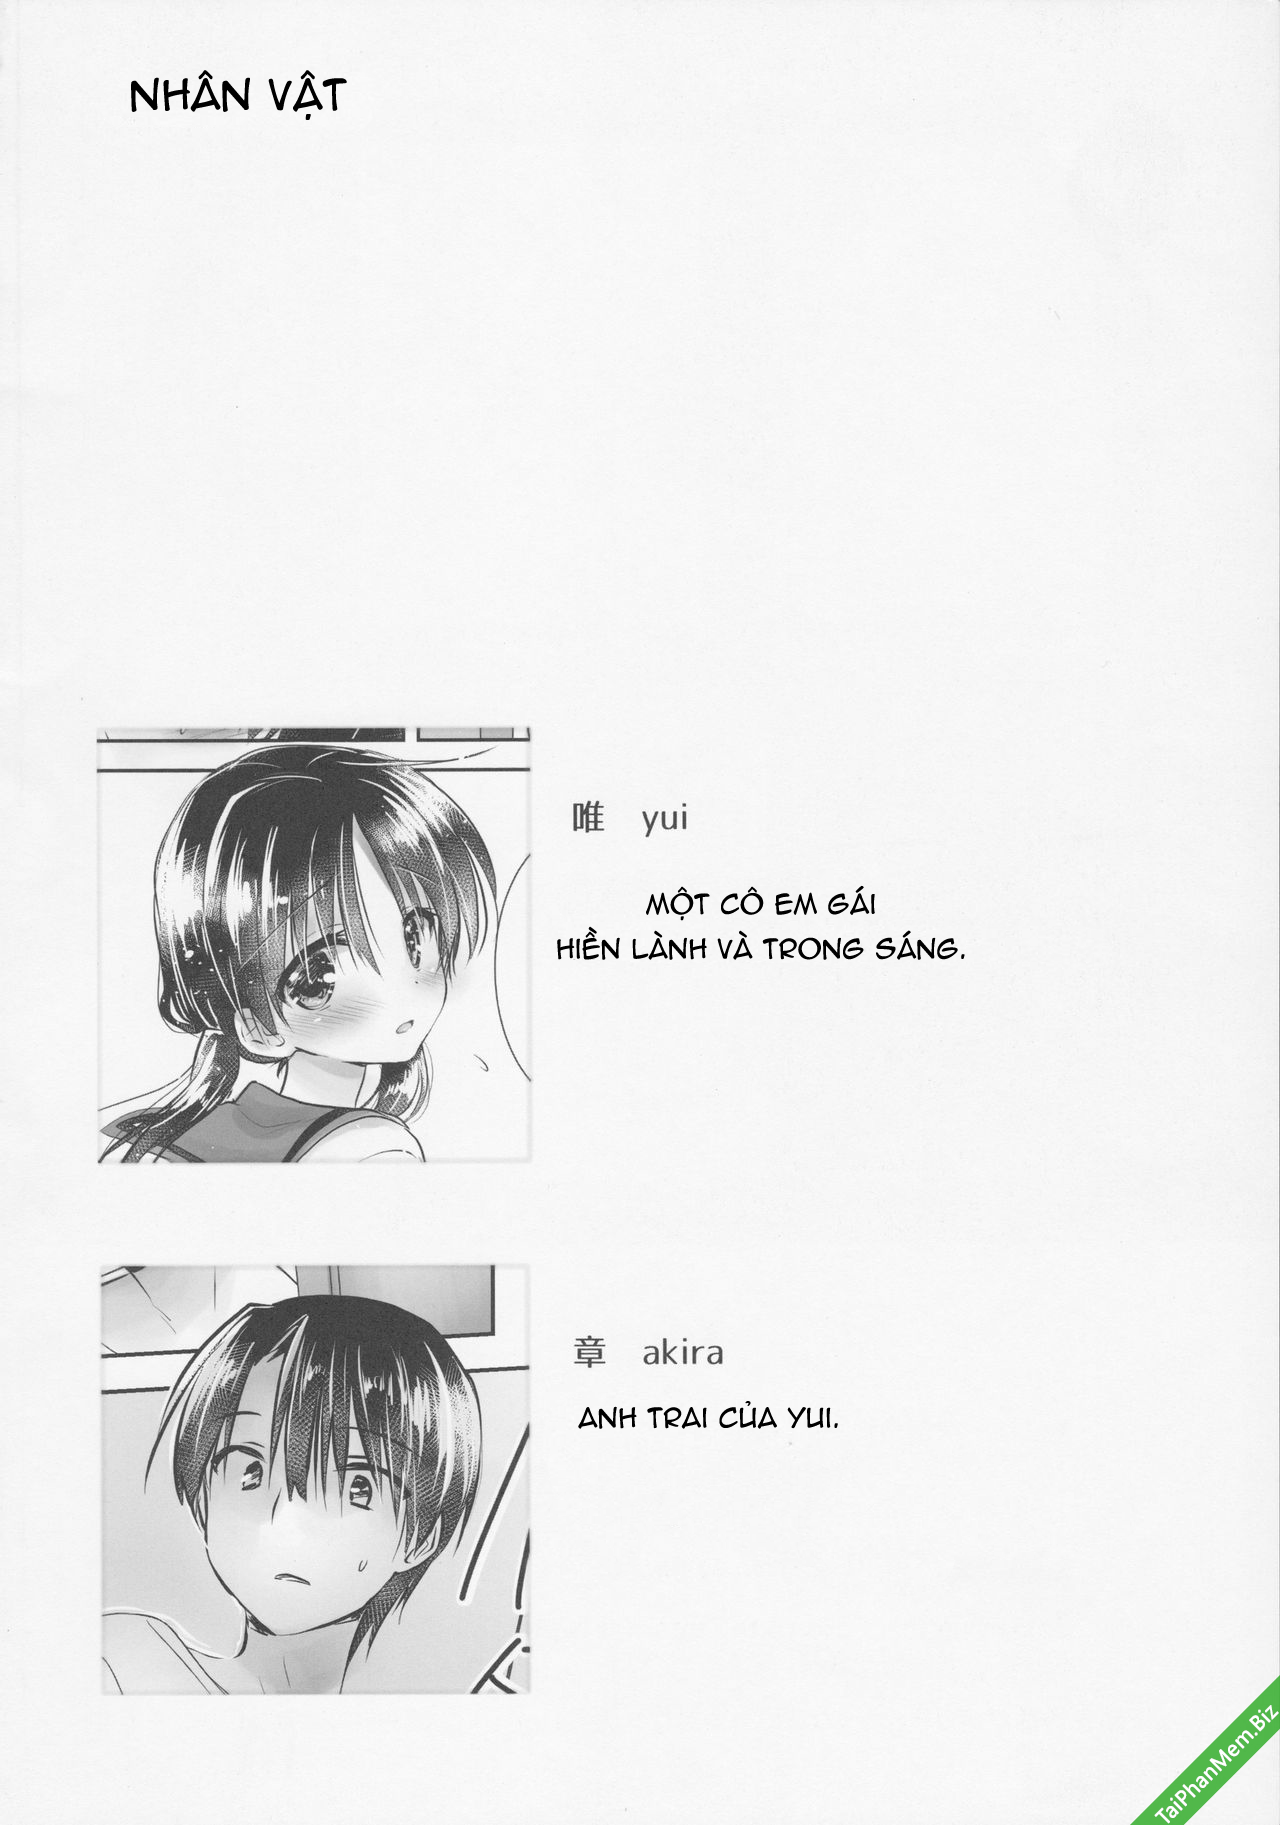 HentaiVN.net - Ảnh 6 - Omocha Sex - Chap 5